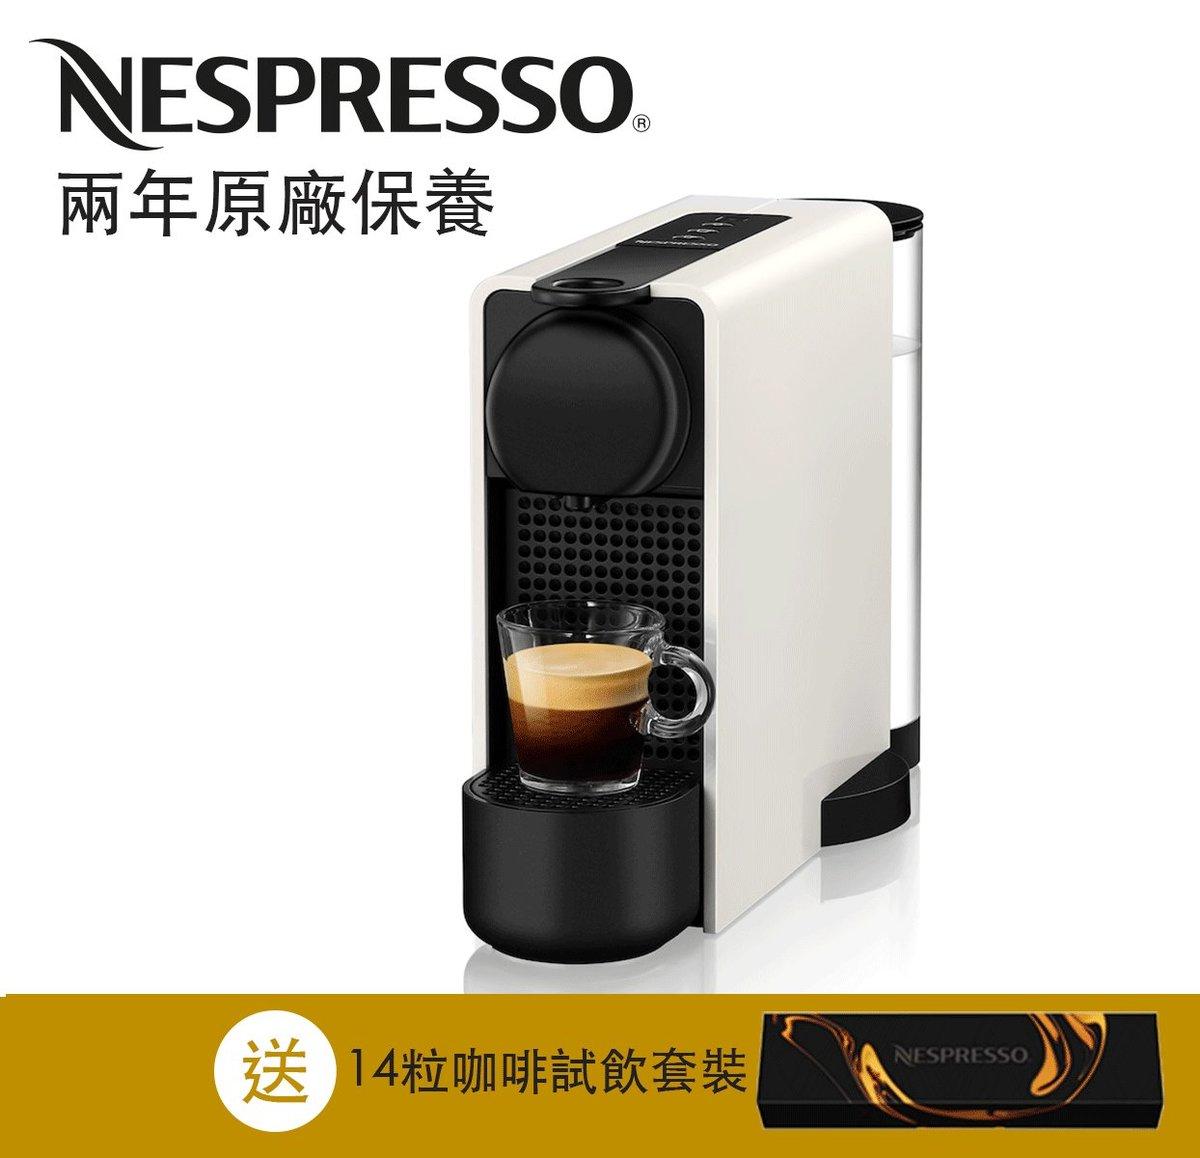 C45 Essenza Plus 咖啡機, 米白色